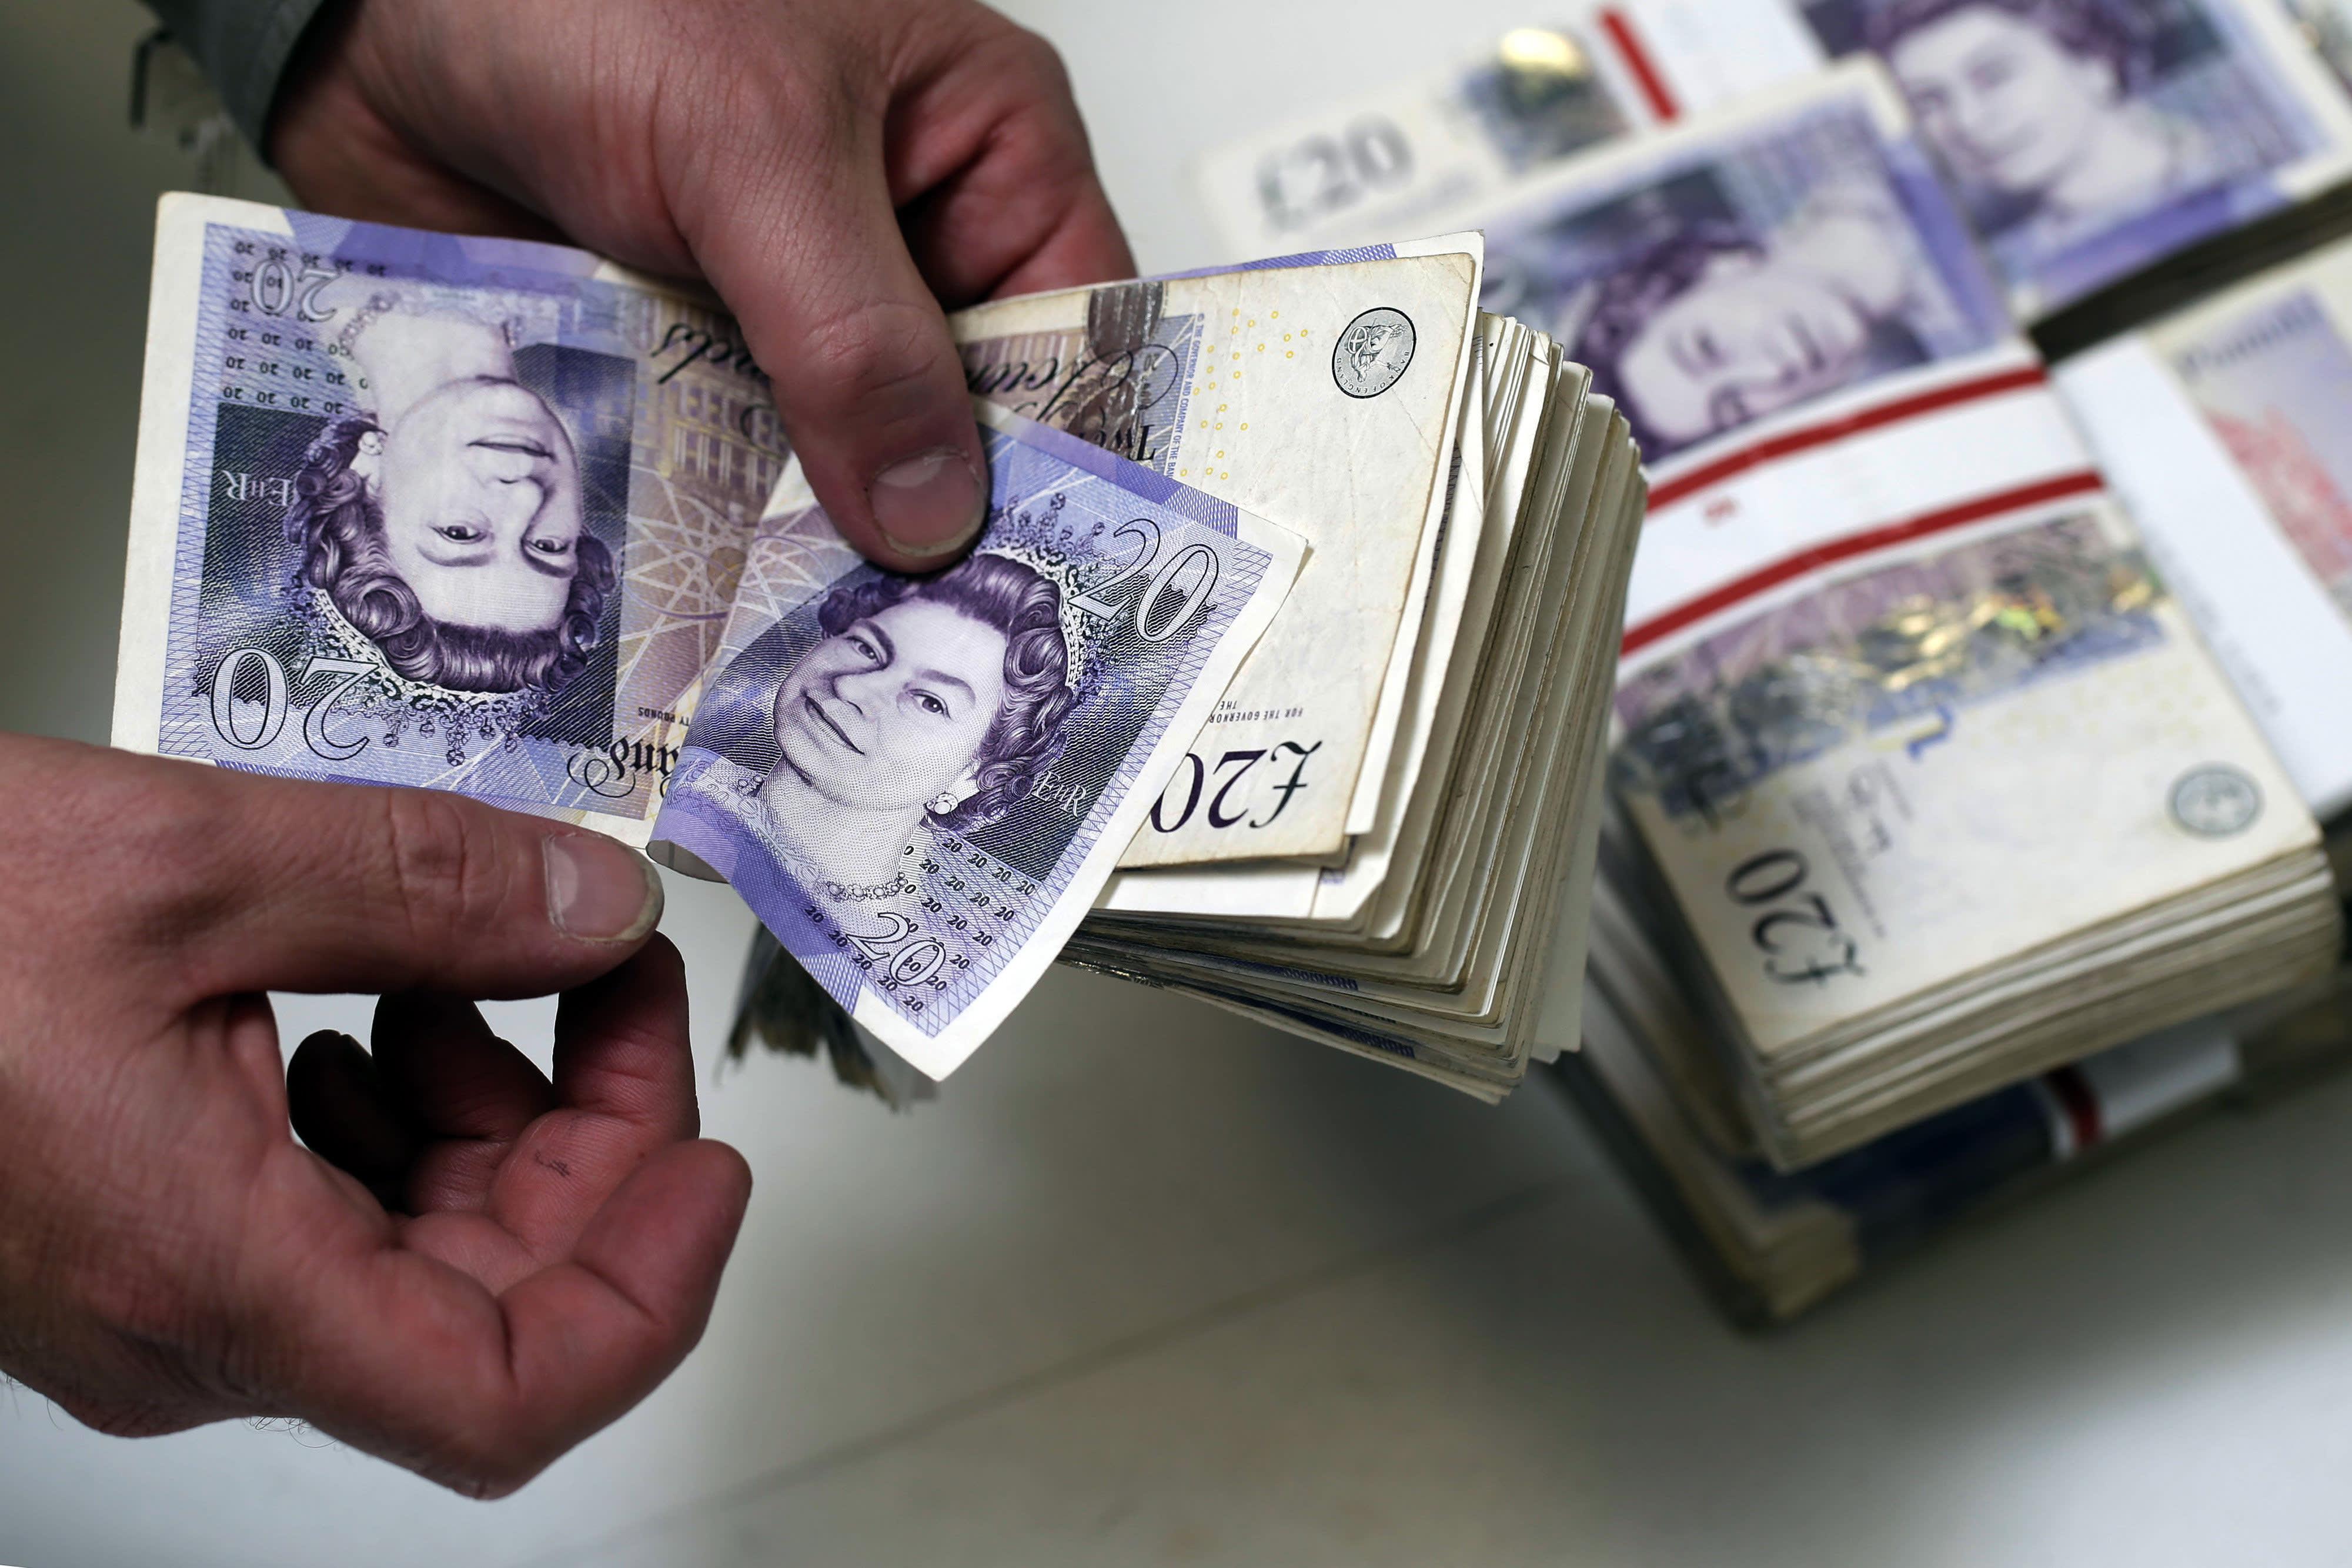 Geffen slams 'very complex' absolute return funds